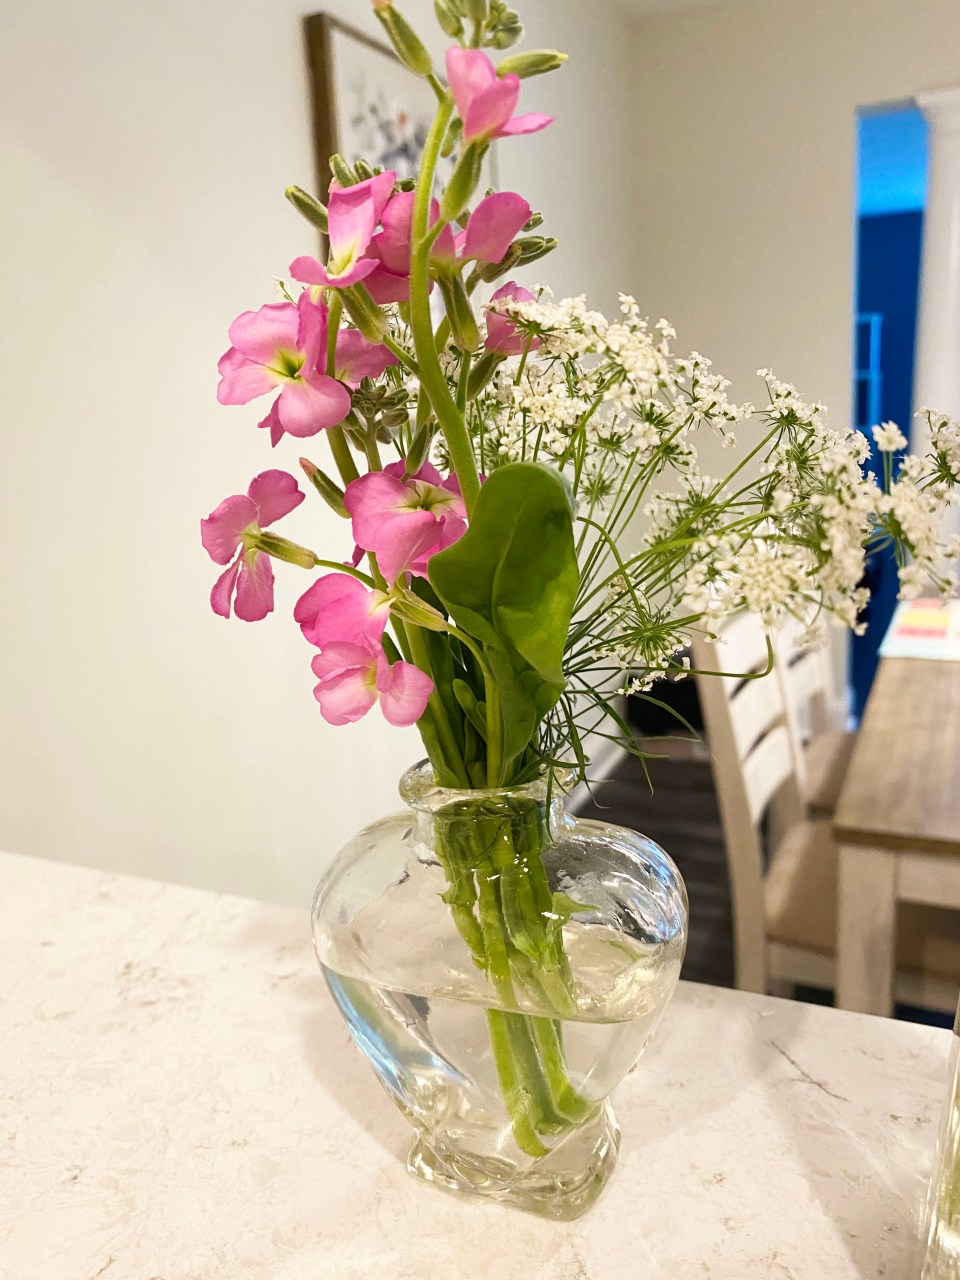 Miniature Vases 2